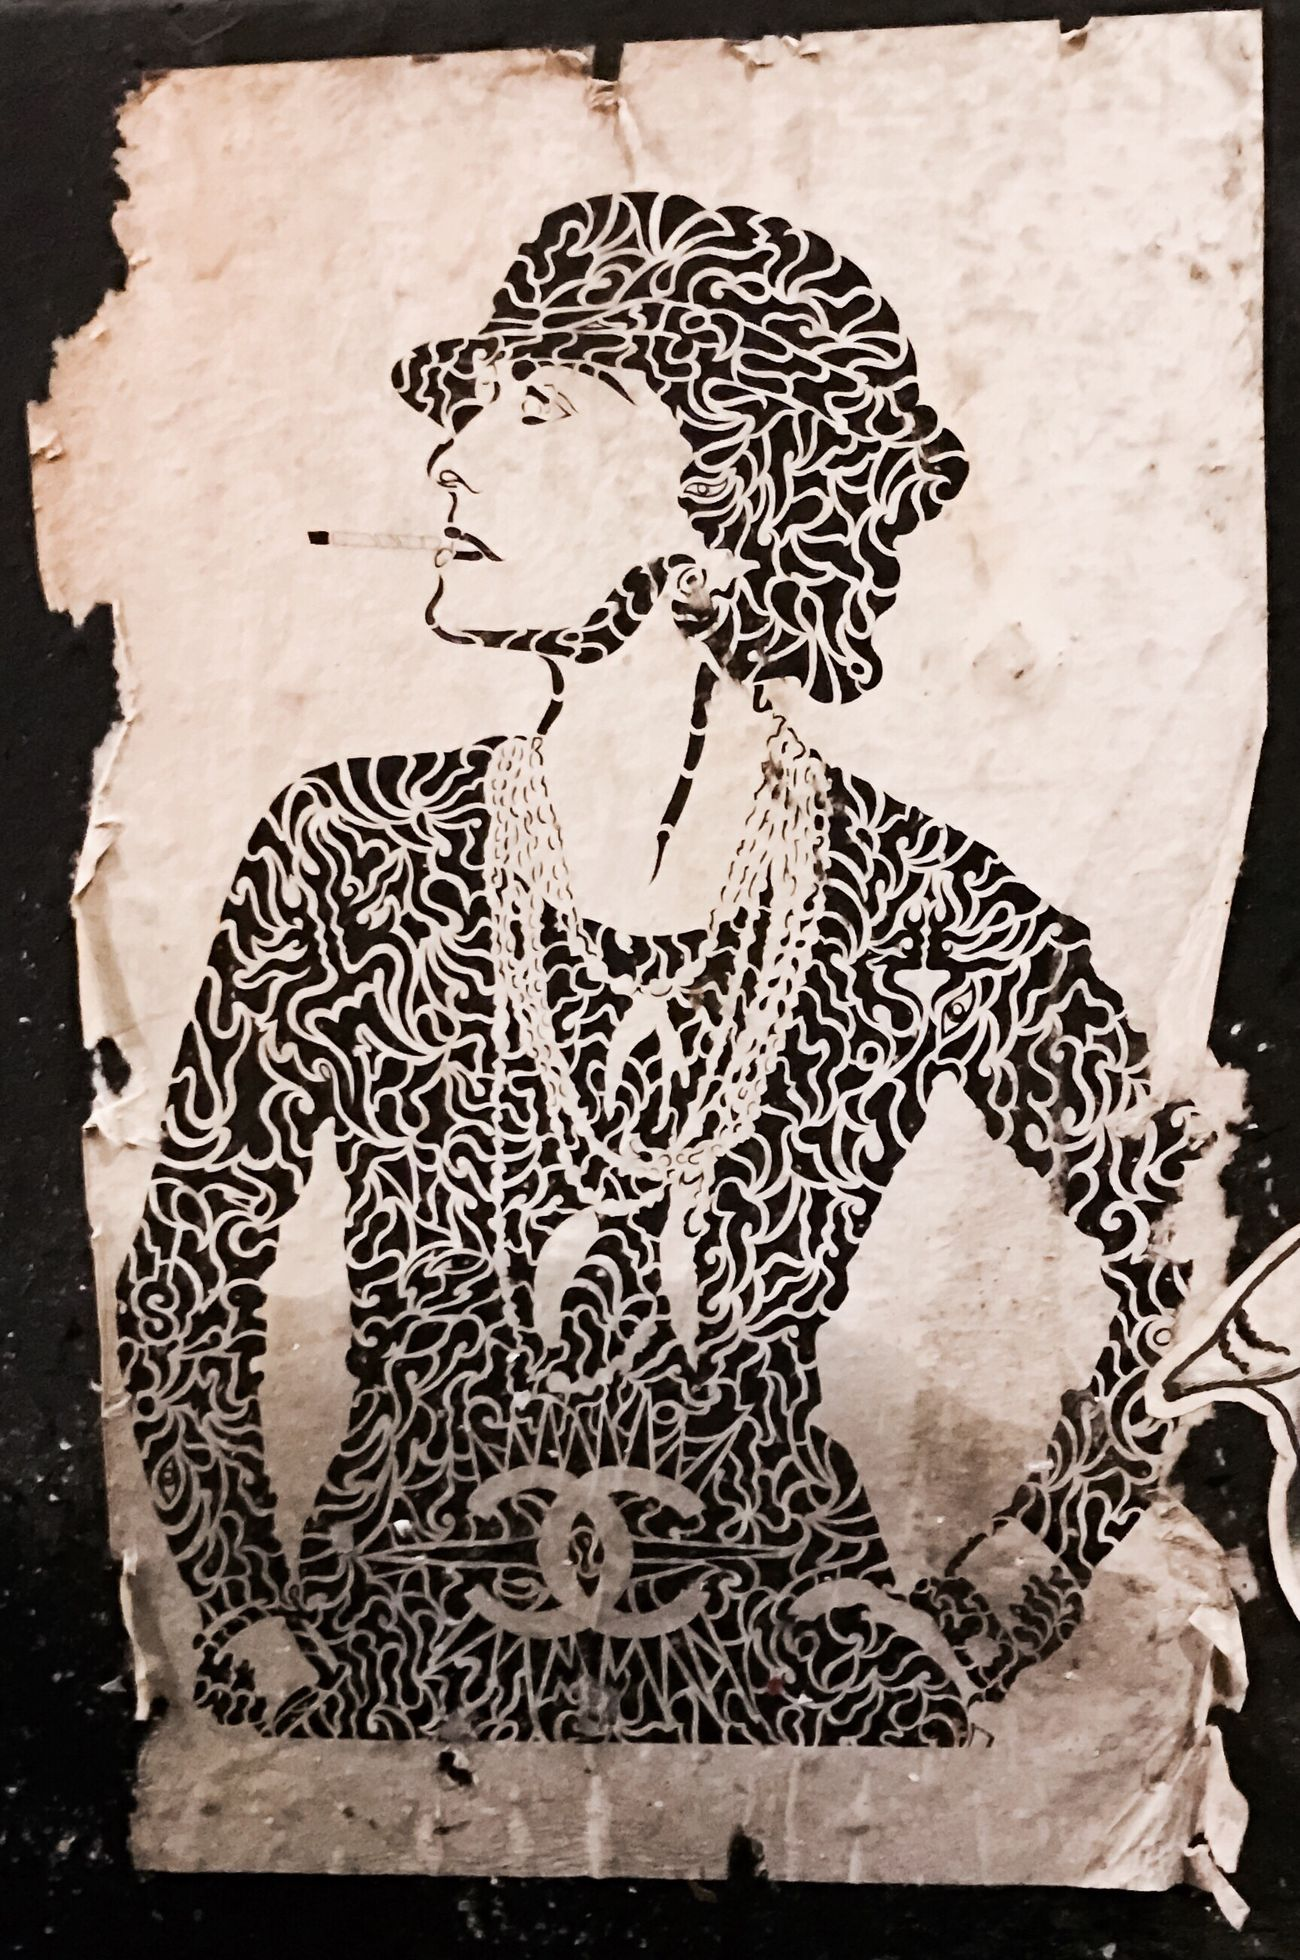 #GabrielleBonheur #Coco #Chanel #manhattan #nyc #fall2016 #timyoungiphoneography